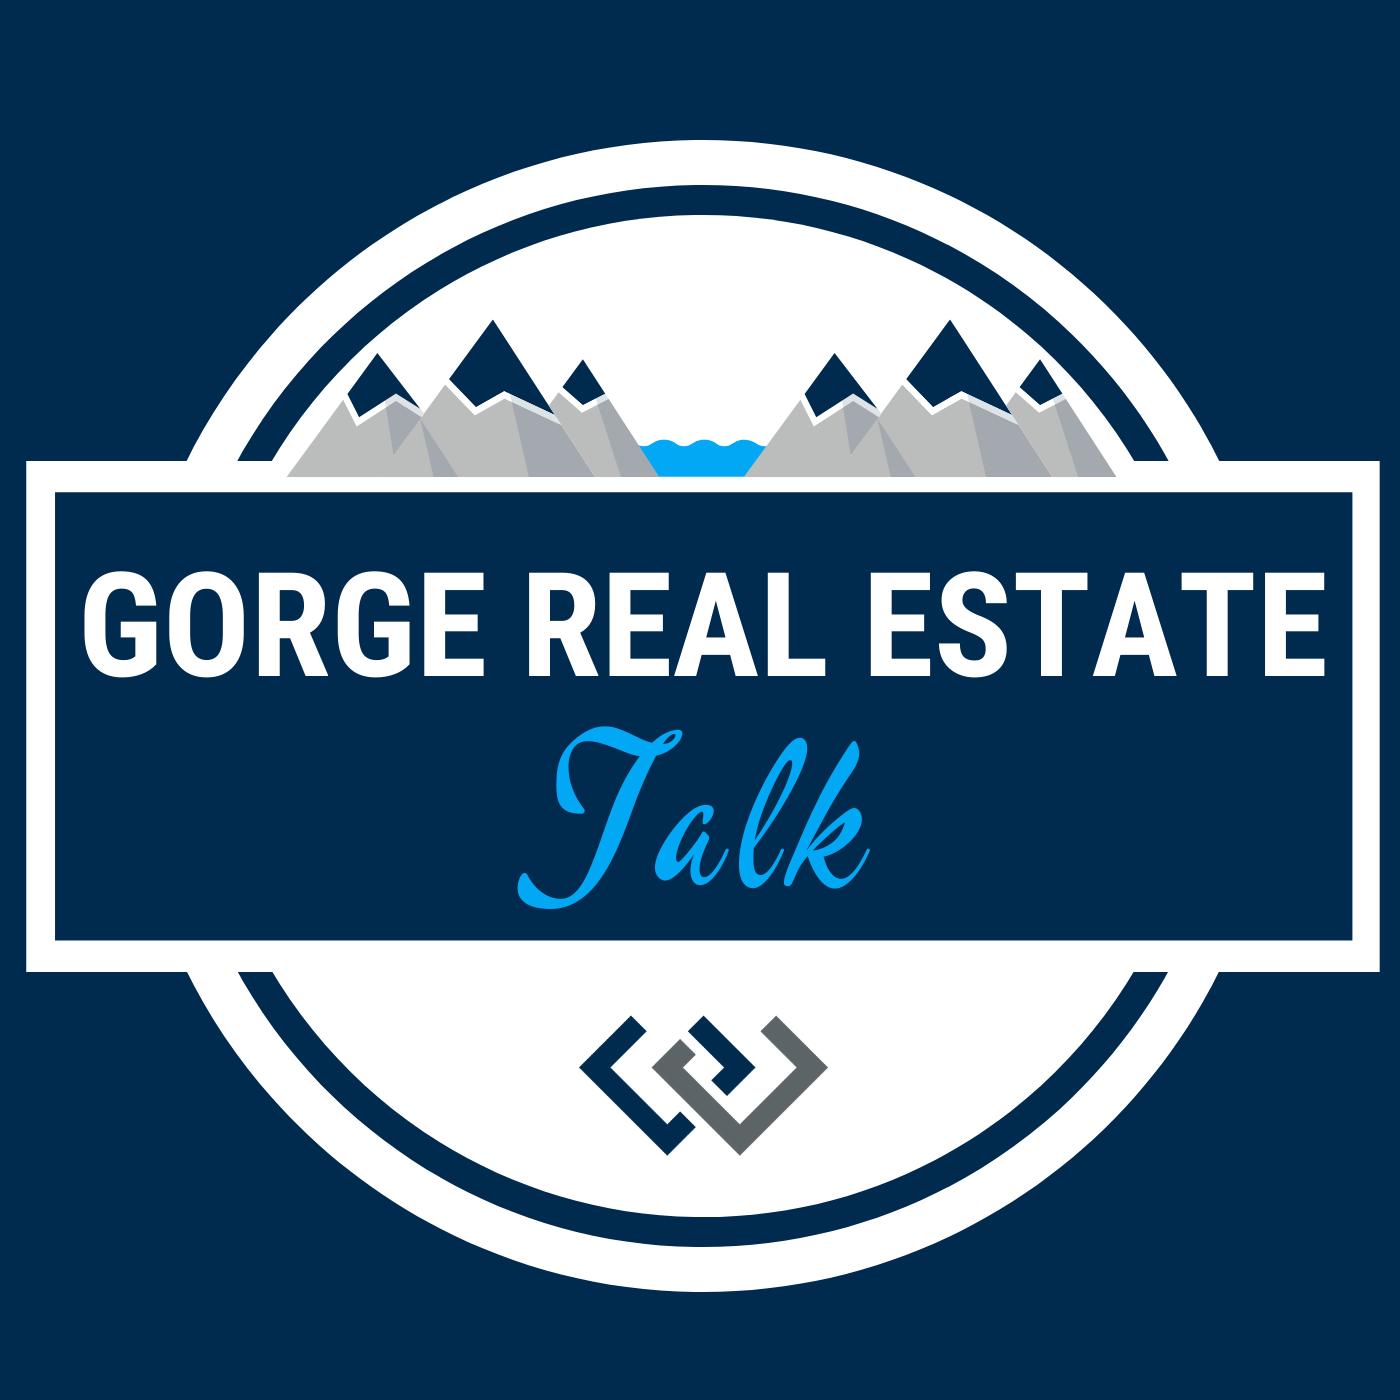 Gorge Real Estate Talk show art